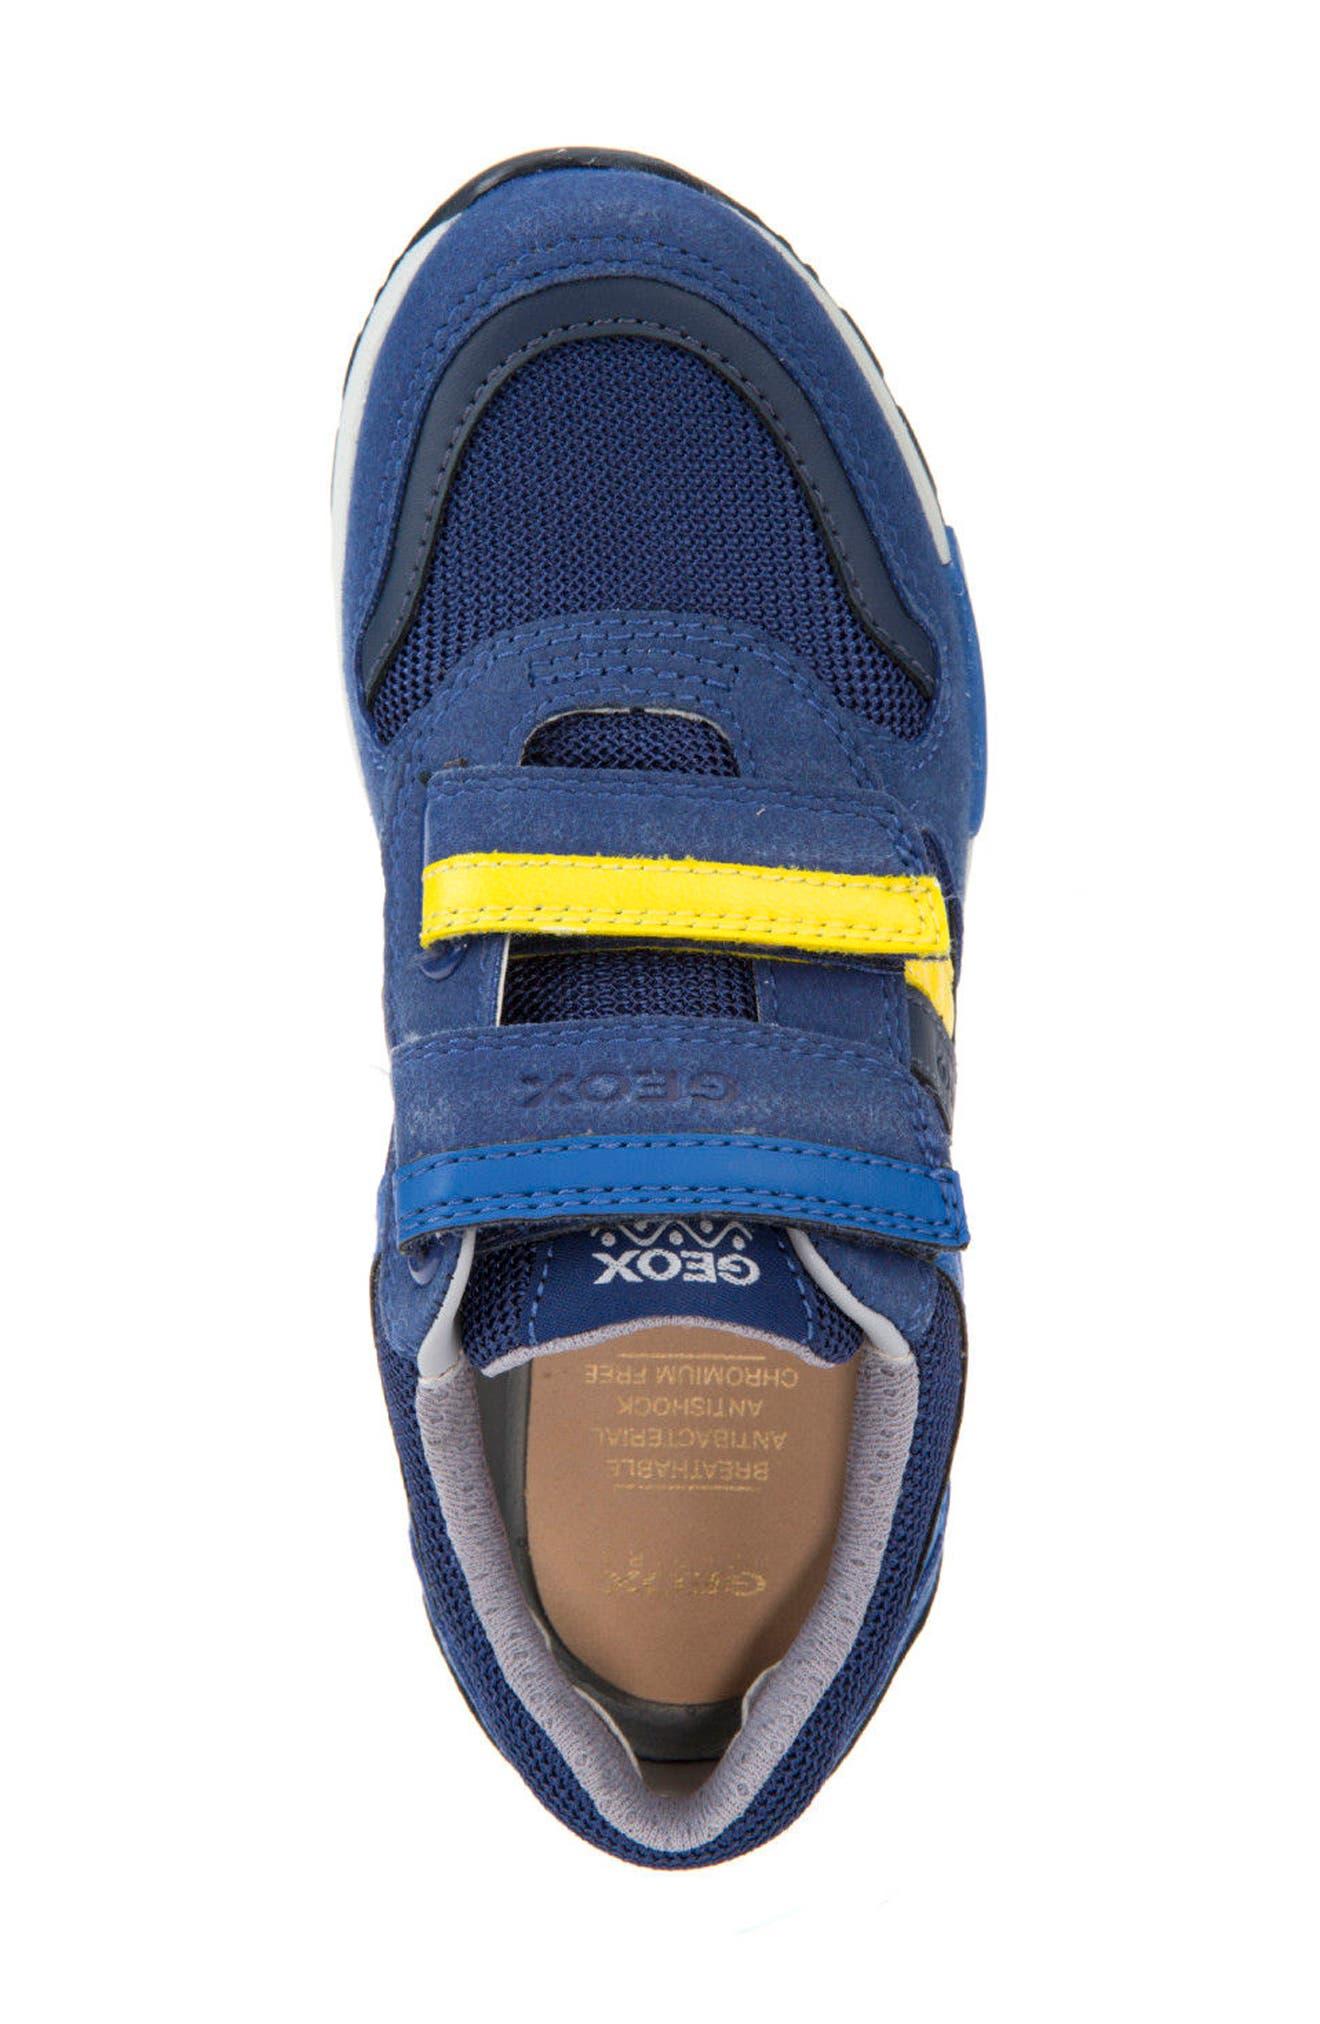 Alfier Stripe Low Top Sneaker,                             Alternate thumbnail 5, color,                             Blue/ Yellow